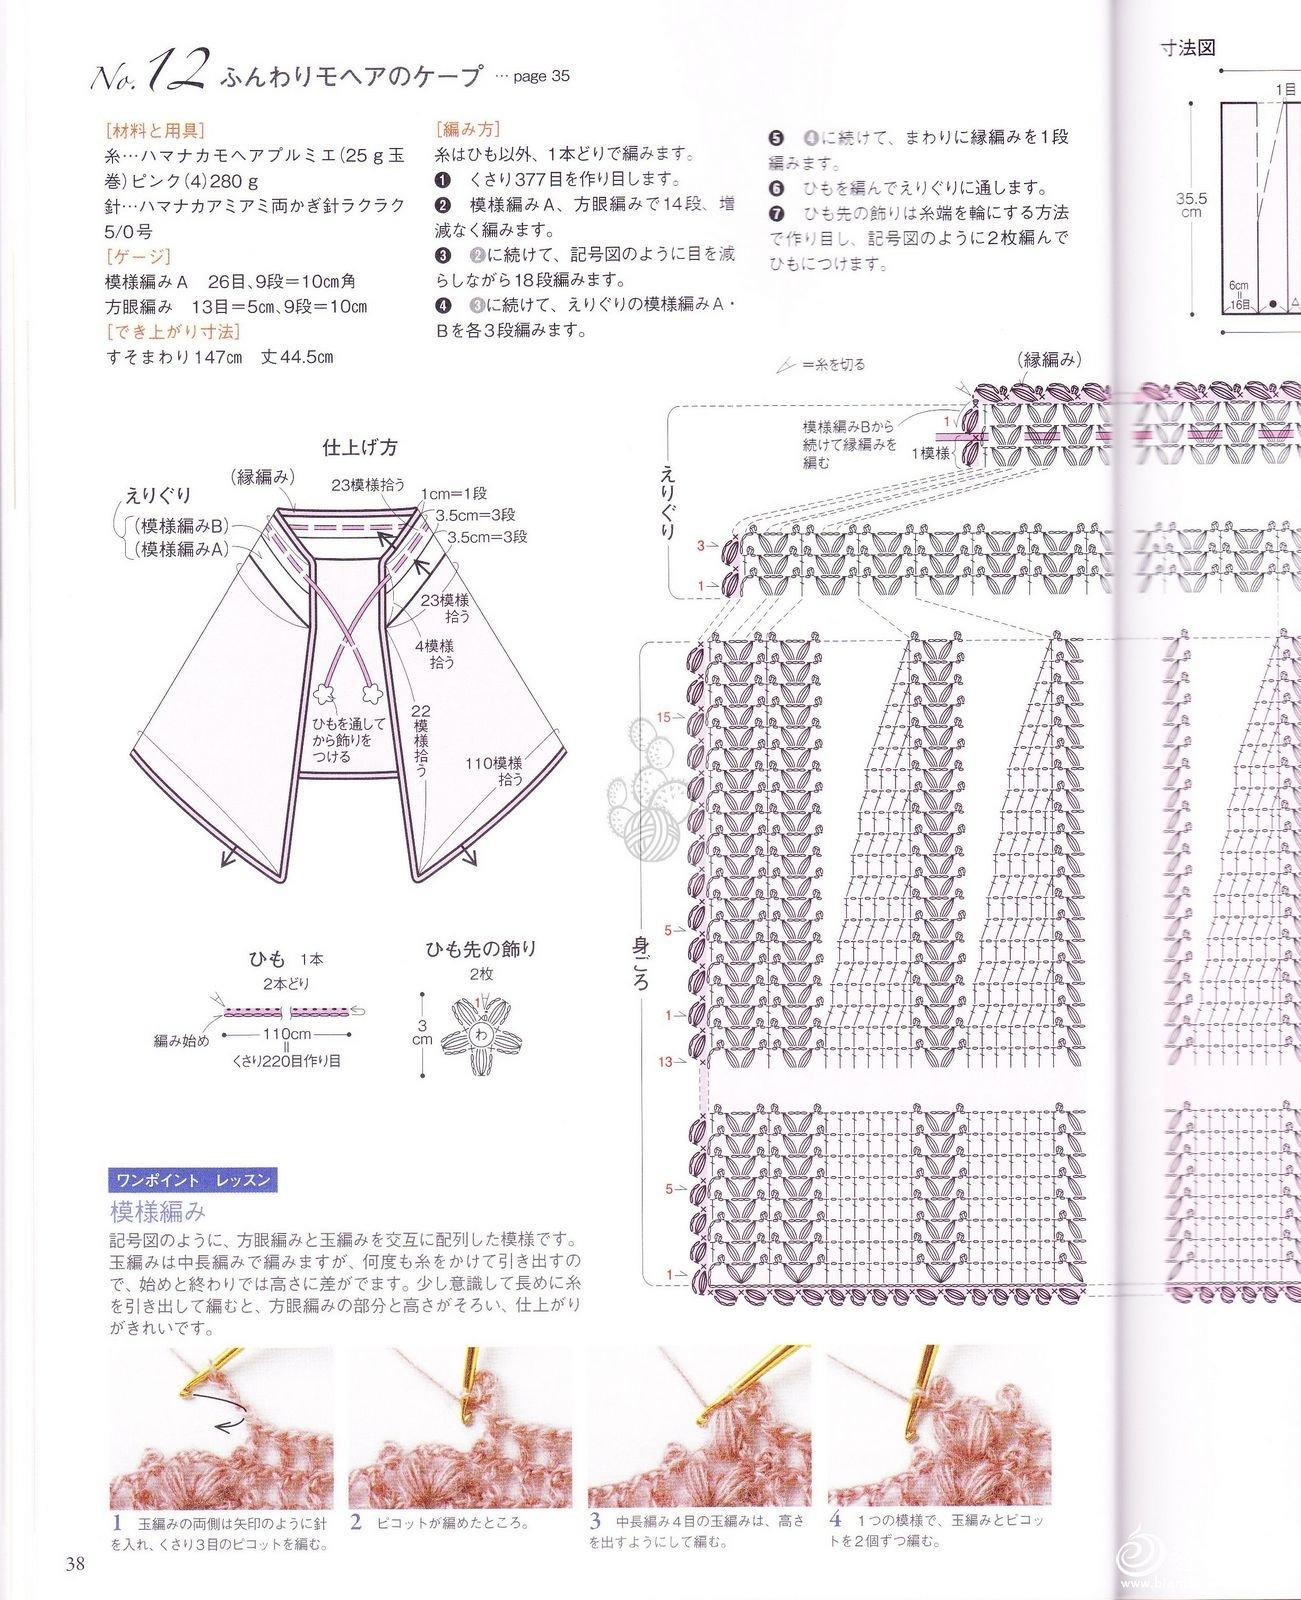 p39.jpg